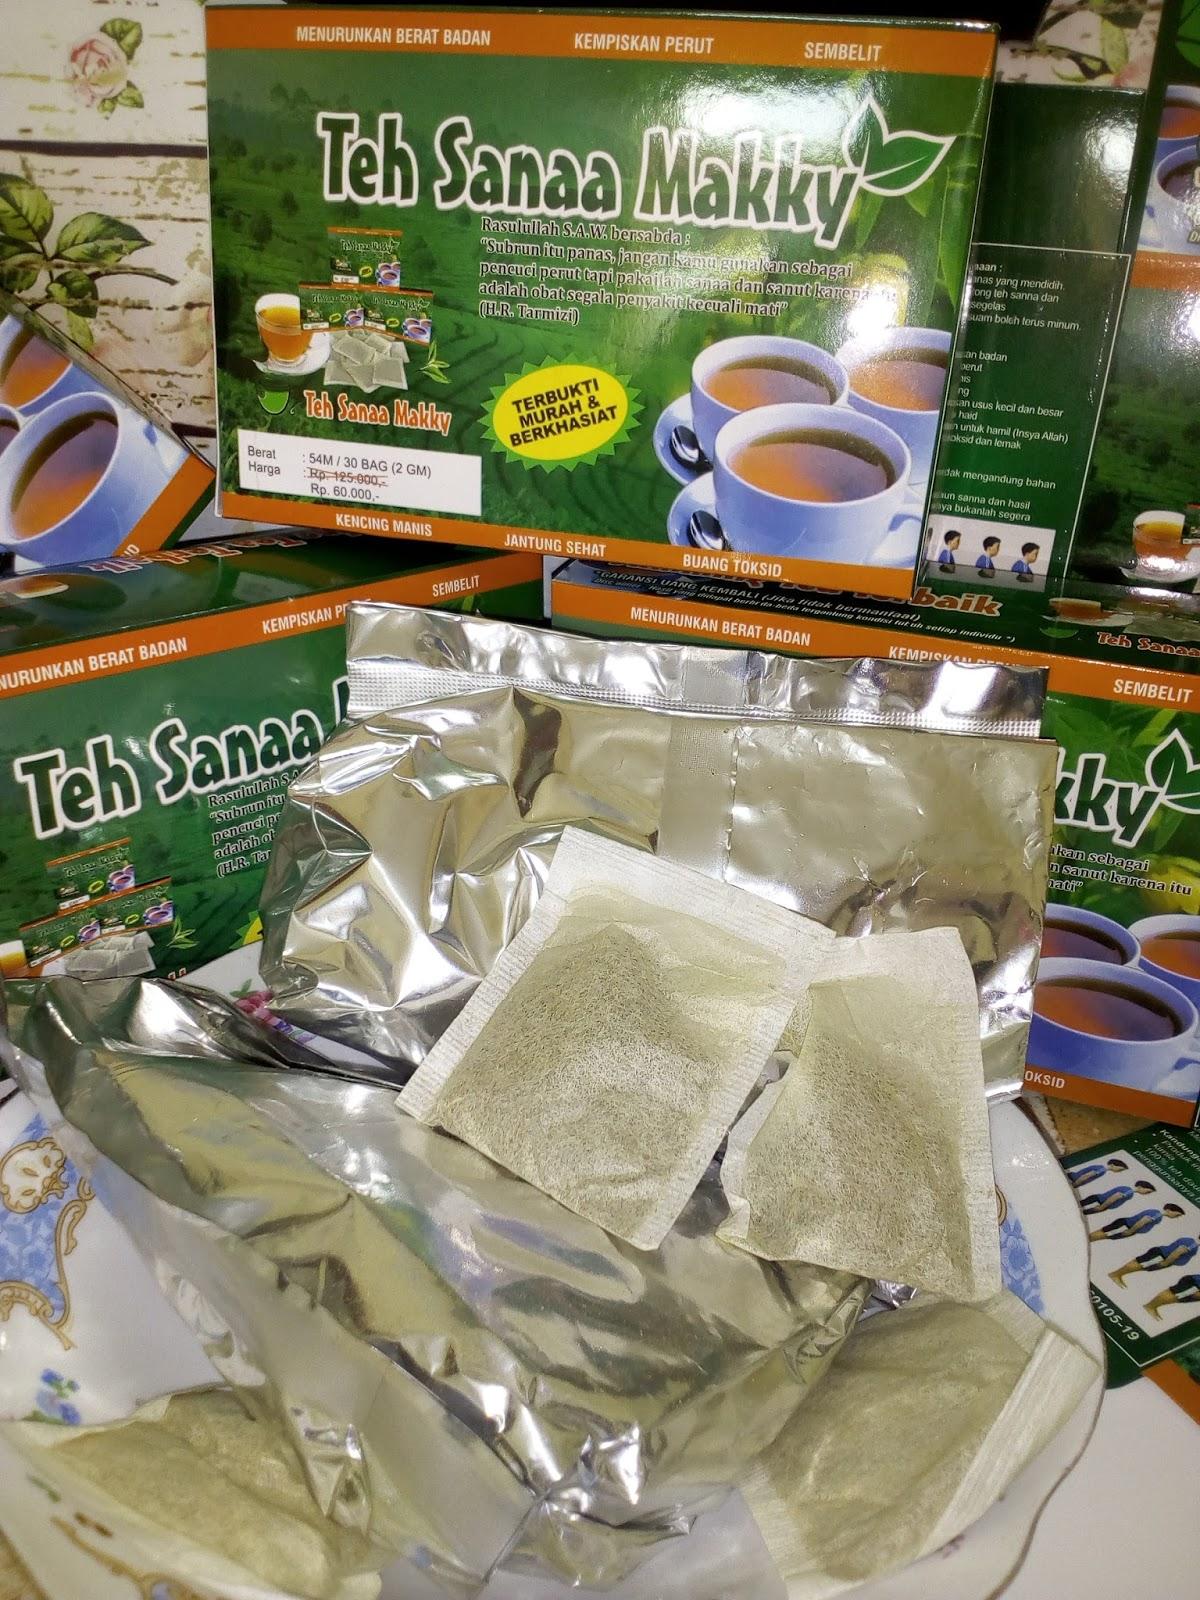 Teh Sanna Malaysia Sanaa Makky Distributor Celup Herbal Daun Jati Cina Melangsingkan Tubuh Mengurangi Kolesterol Memang Sempat Booming Beberapa Waktu Yang Lalu Sebagai Pelangsing Tapi Benarkah Terbukti Dapat Menurunkan Berat